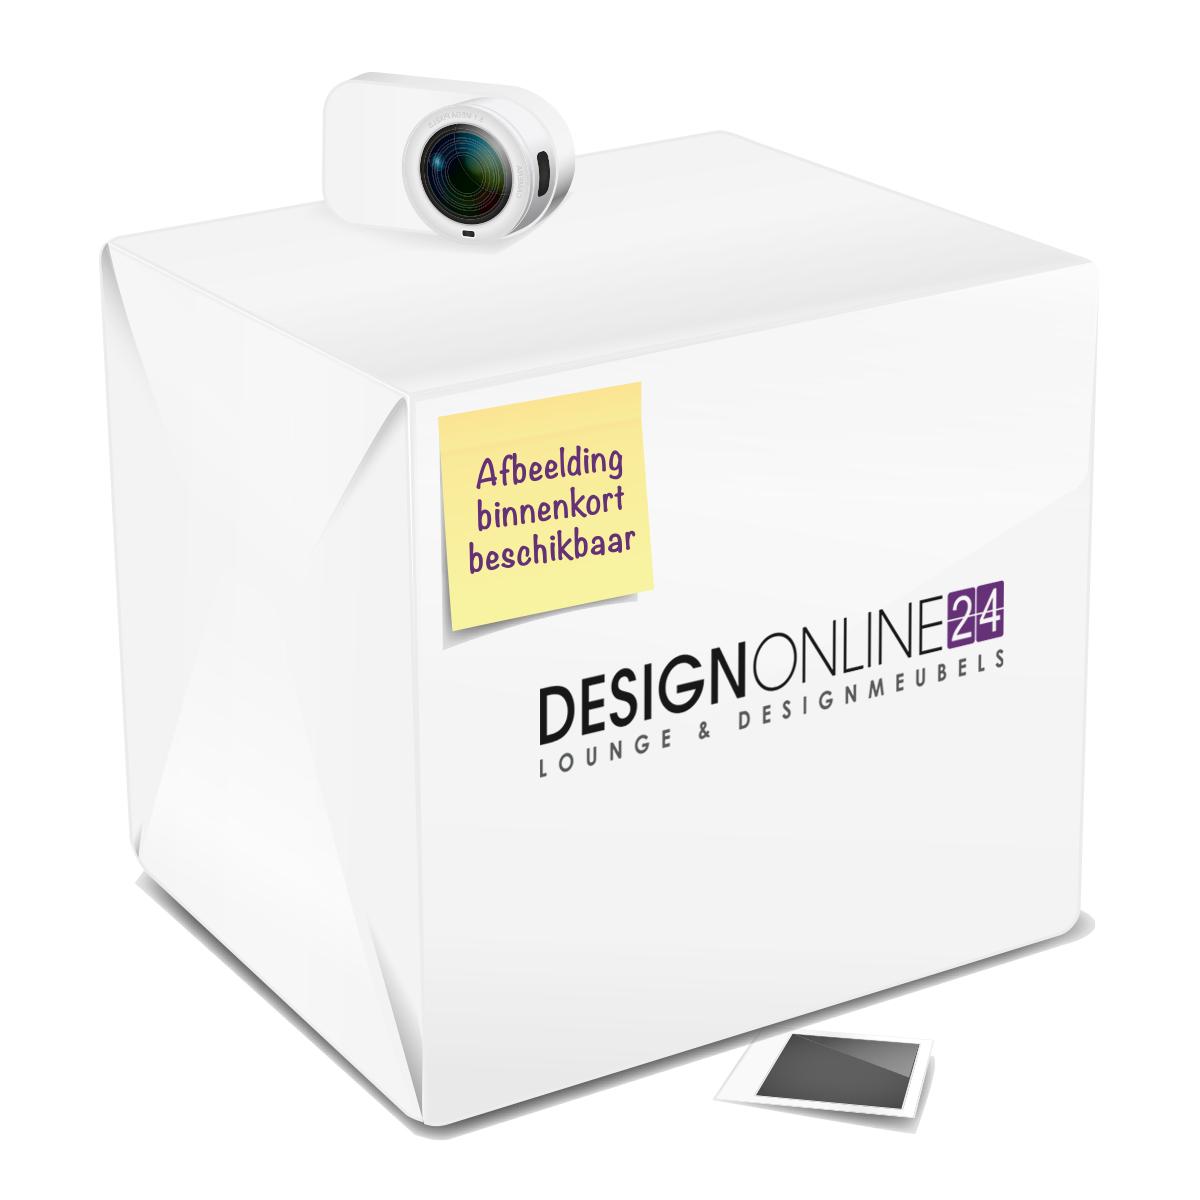 d-Bodhi Fendy Locker Kast - 3 Deurs - L120 x B40 x H160 cm - Teakhout + Gratis Design Tafellamp twv € 79,95